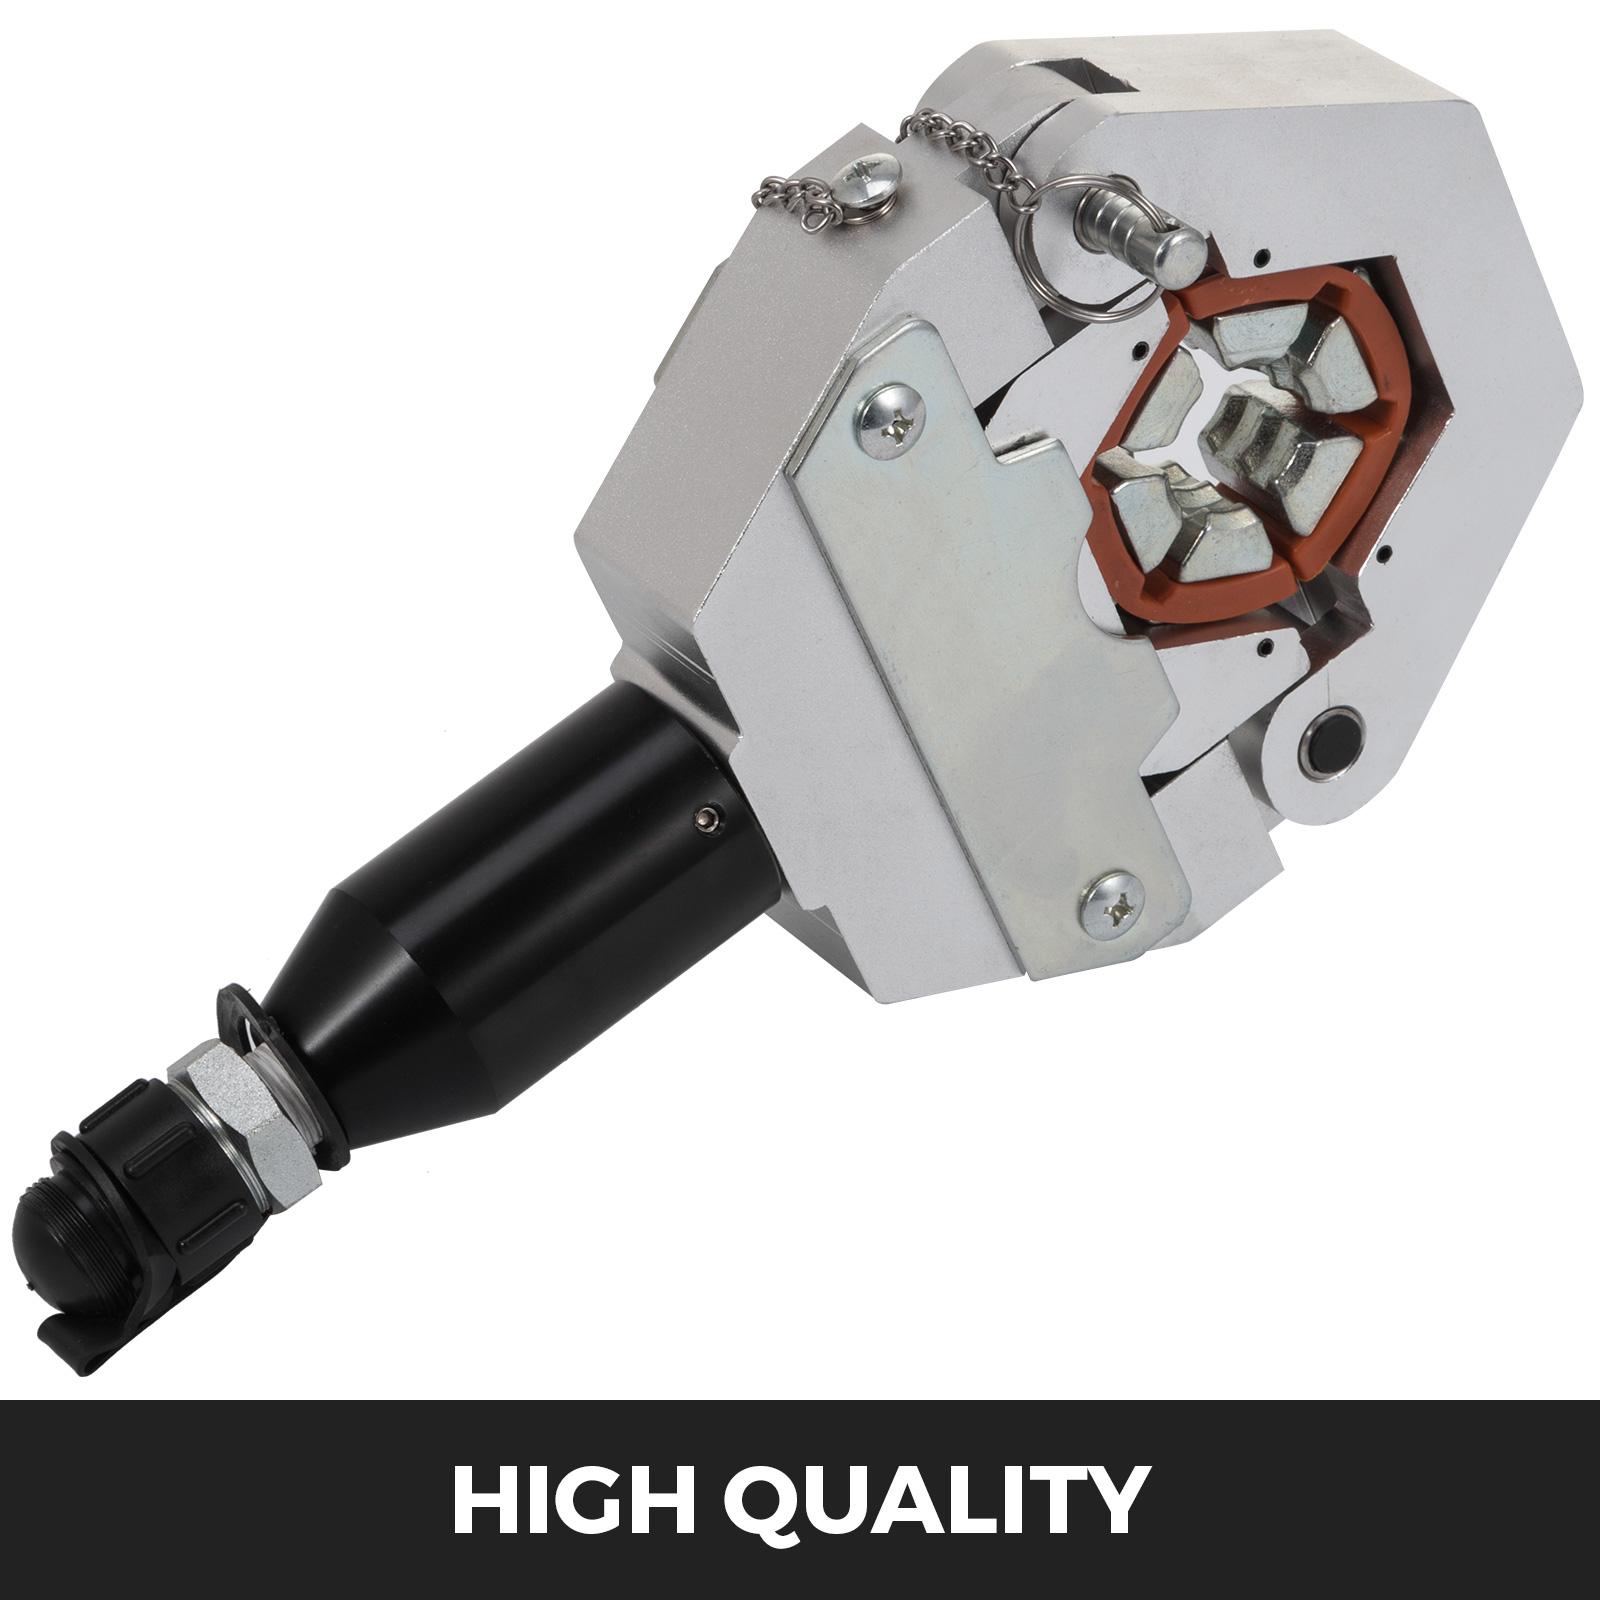 Hydraulic-A-C-Hose-Crimper-Tool-Kit-Hand-Tool-Crimping-Set-Hose-Fittings-7-Dies thumbnail 2